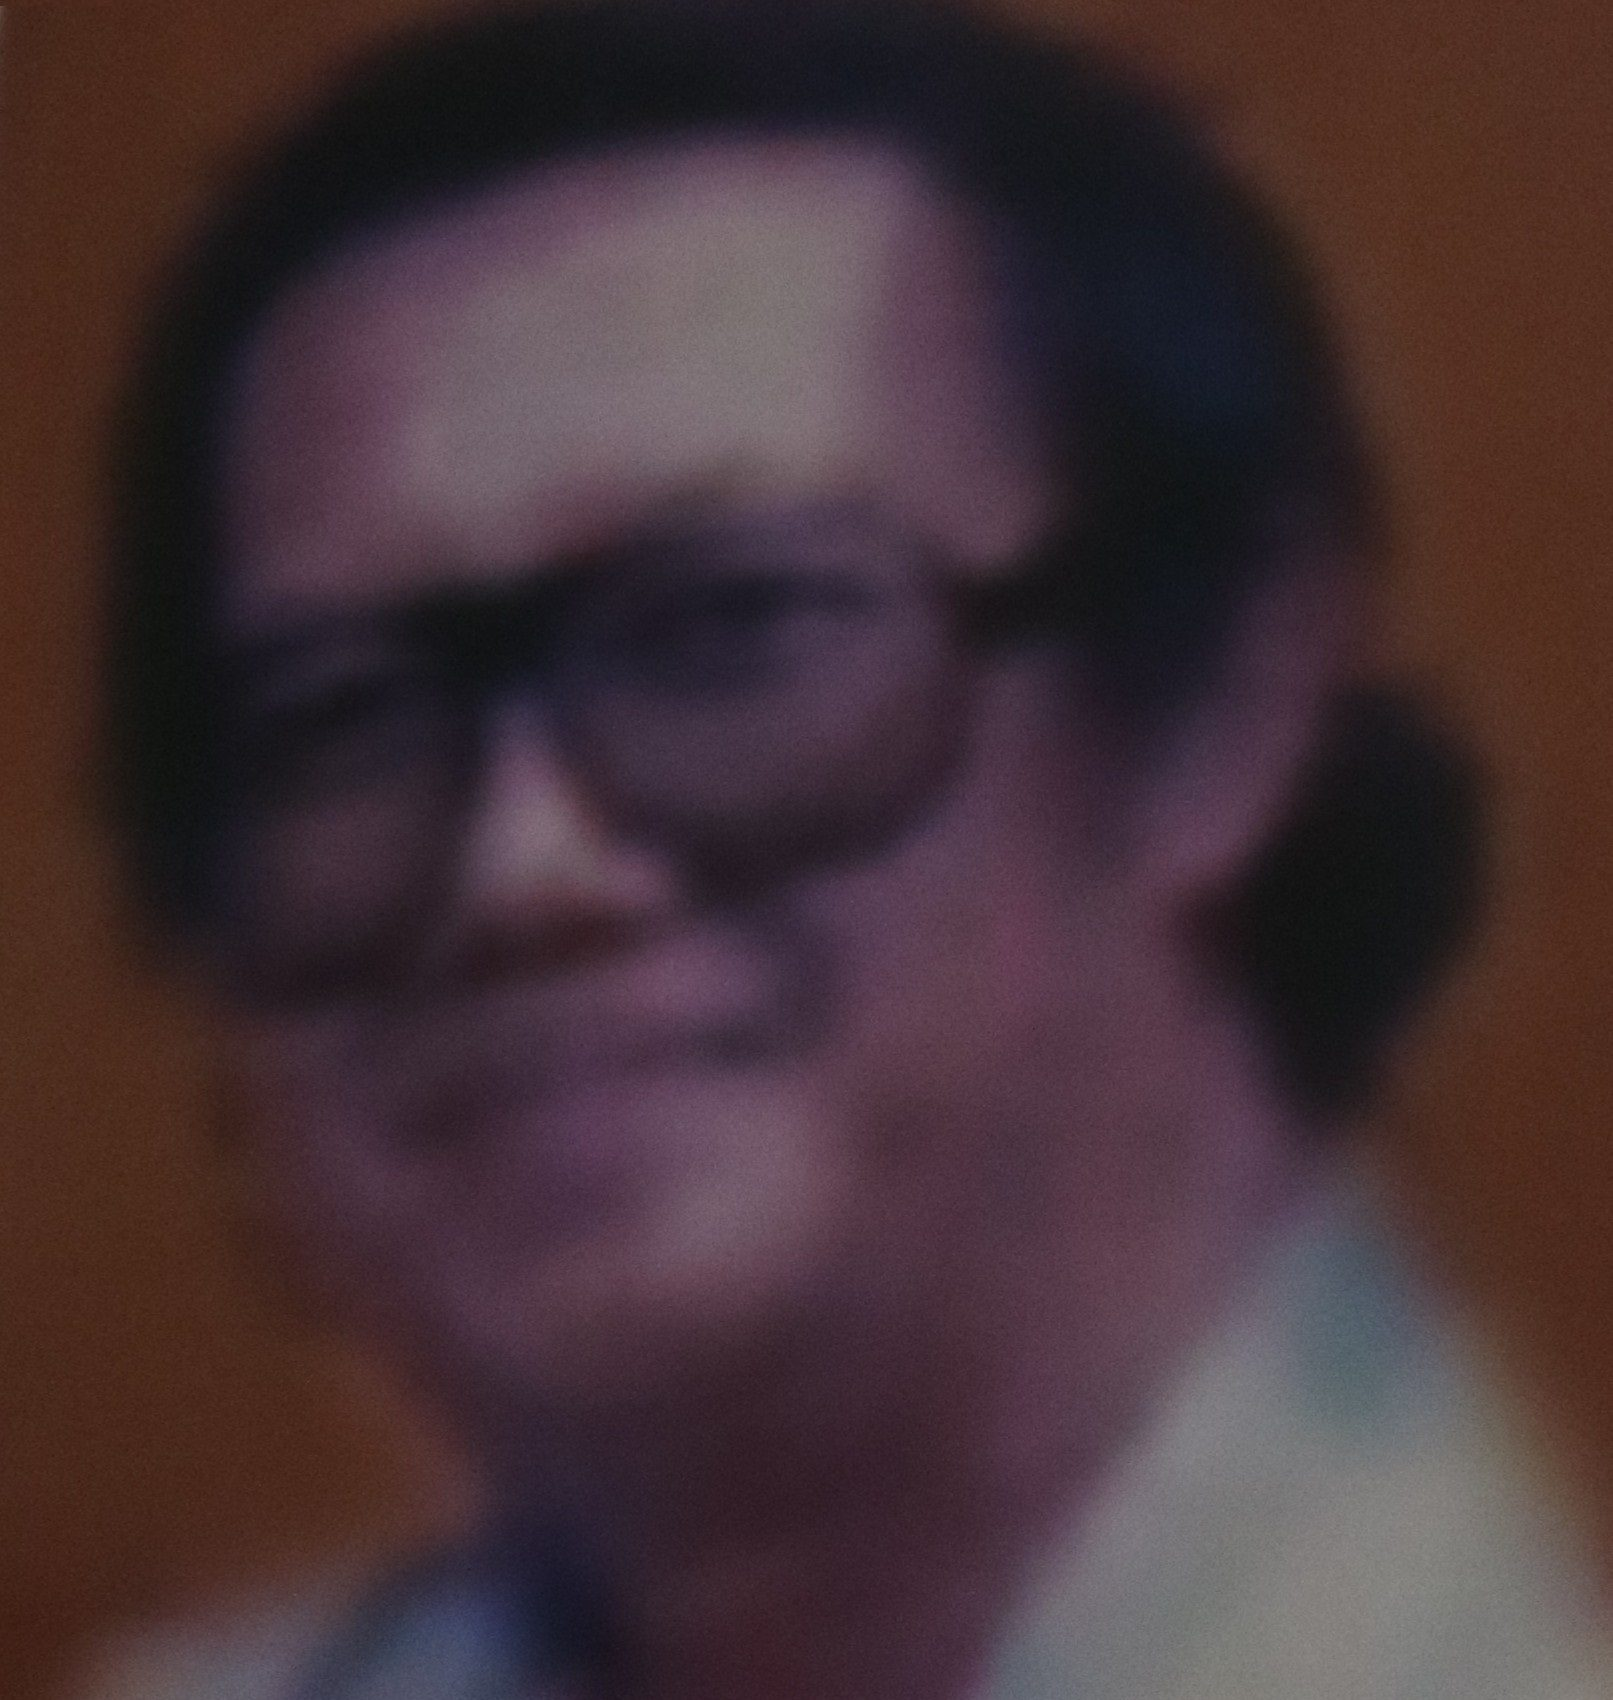 Hazim Amir merupakan manusia unik multi-talenta, lintas sektoral, dan berdaya jelajah intelektual luas yang dimiliki oleh Universitas Negeri Malang